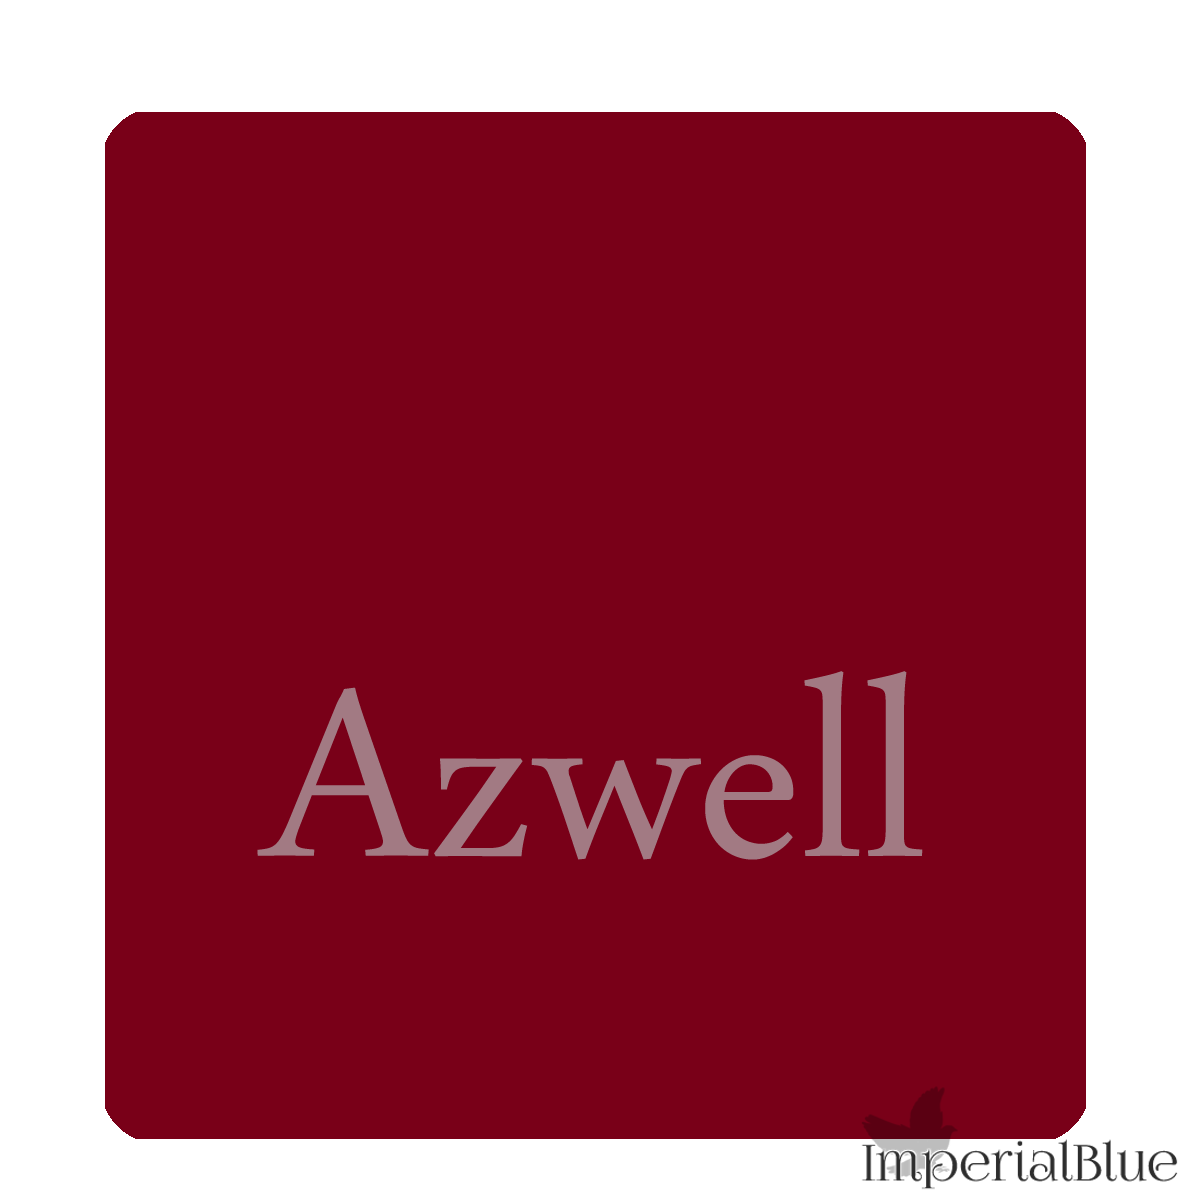 azwel